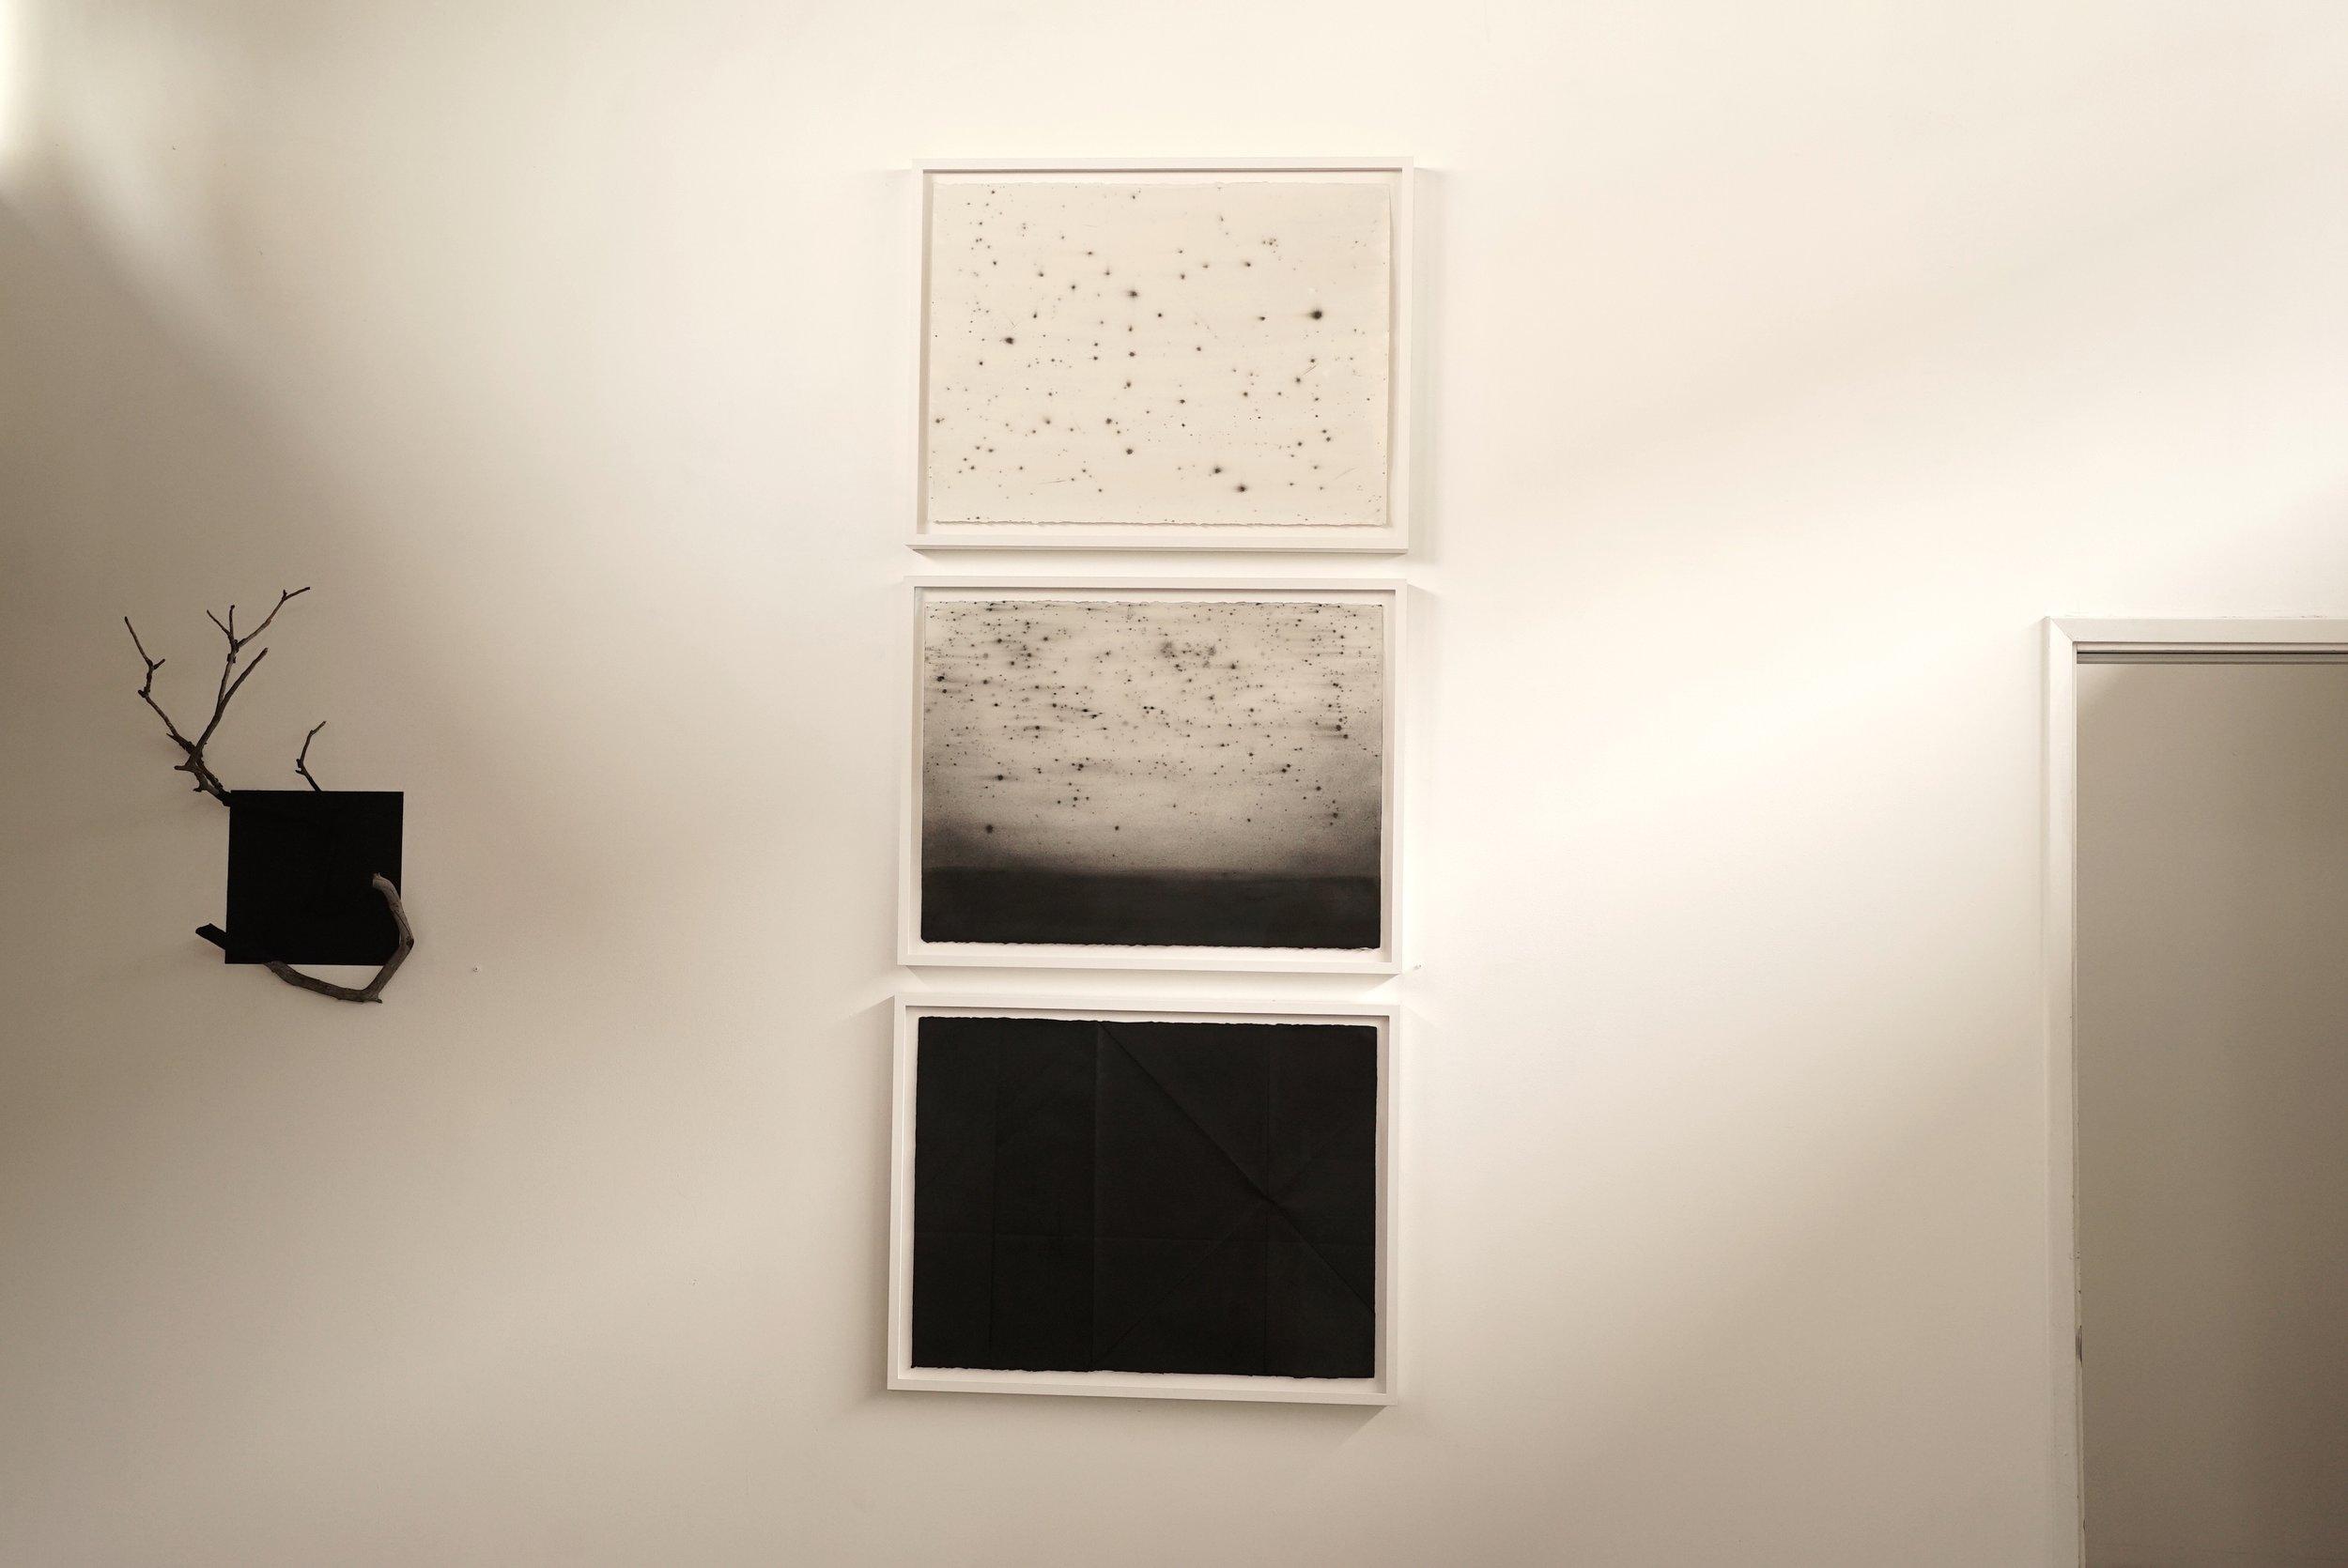 "Dessert Shakes.  2017 Triptych 3 x 101 x 56 cm/ 40 x 22"" Charcoal, pigment, wax on paper"